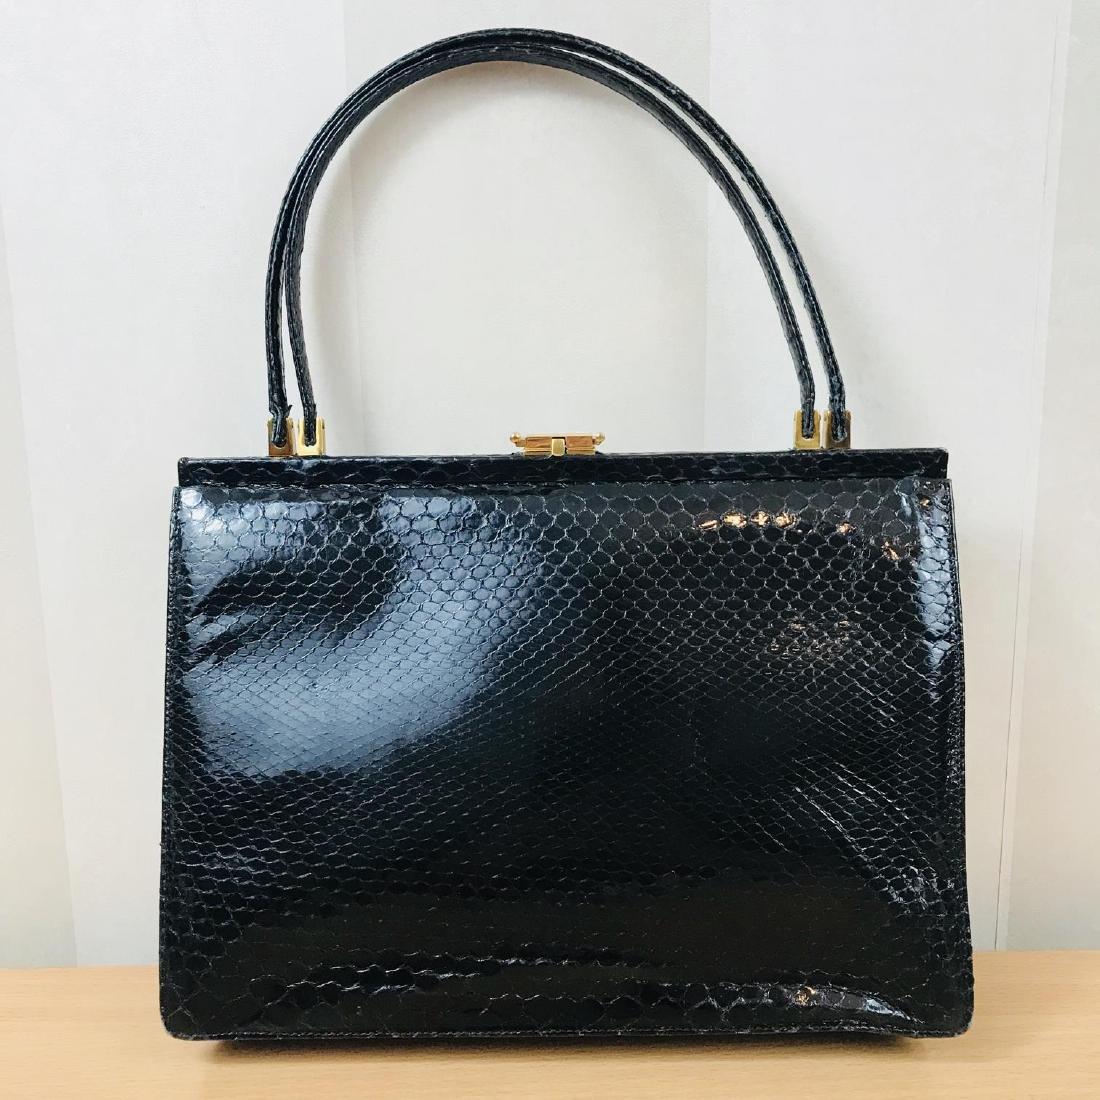 Vintage Black Snakeskin Leather Handbag